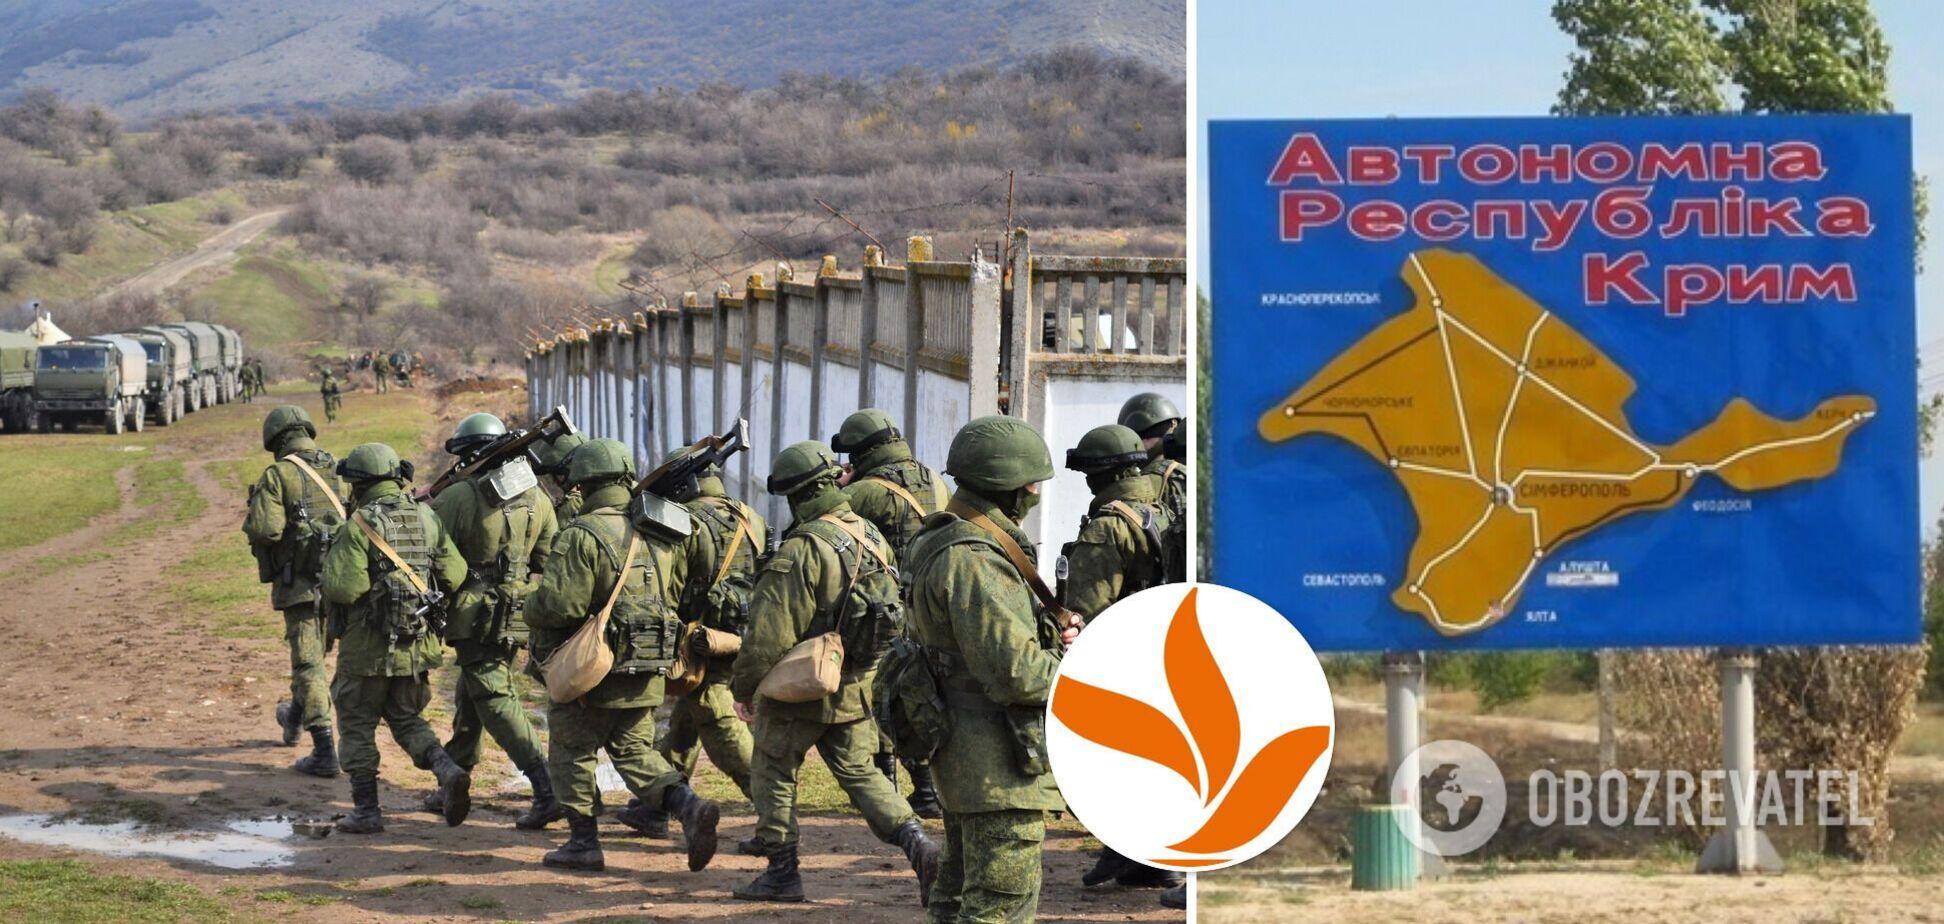 Сайт 'Радіо Свобода' потрапив в скандал через Крим